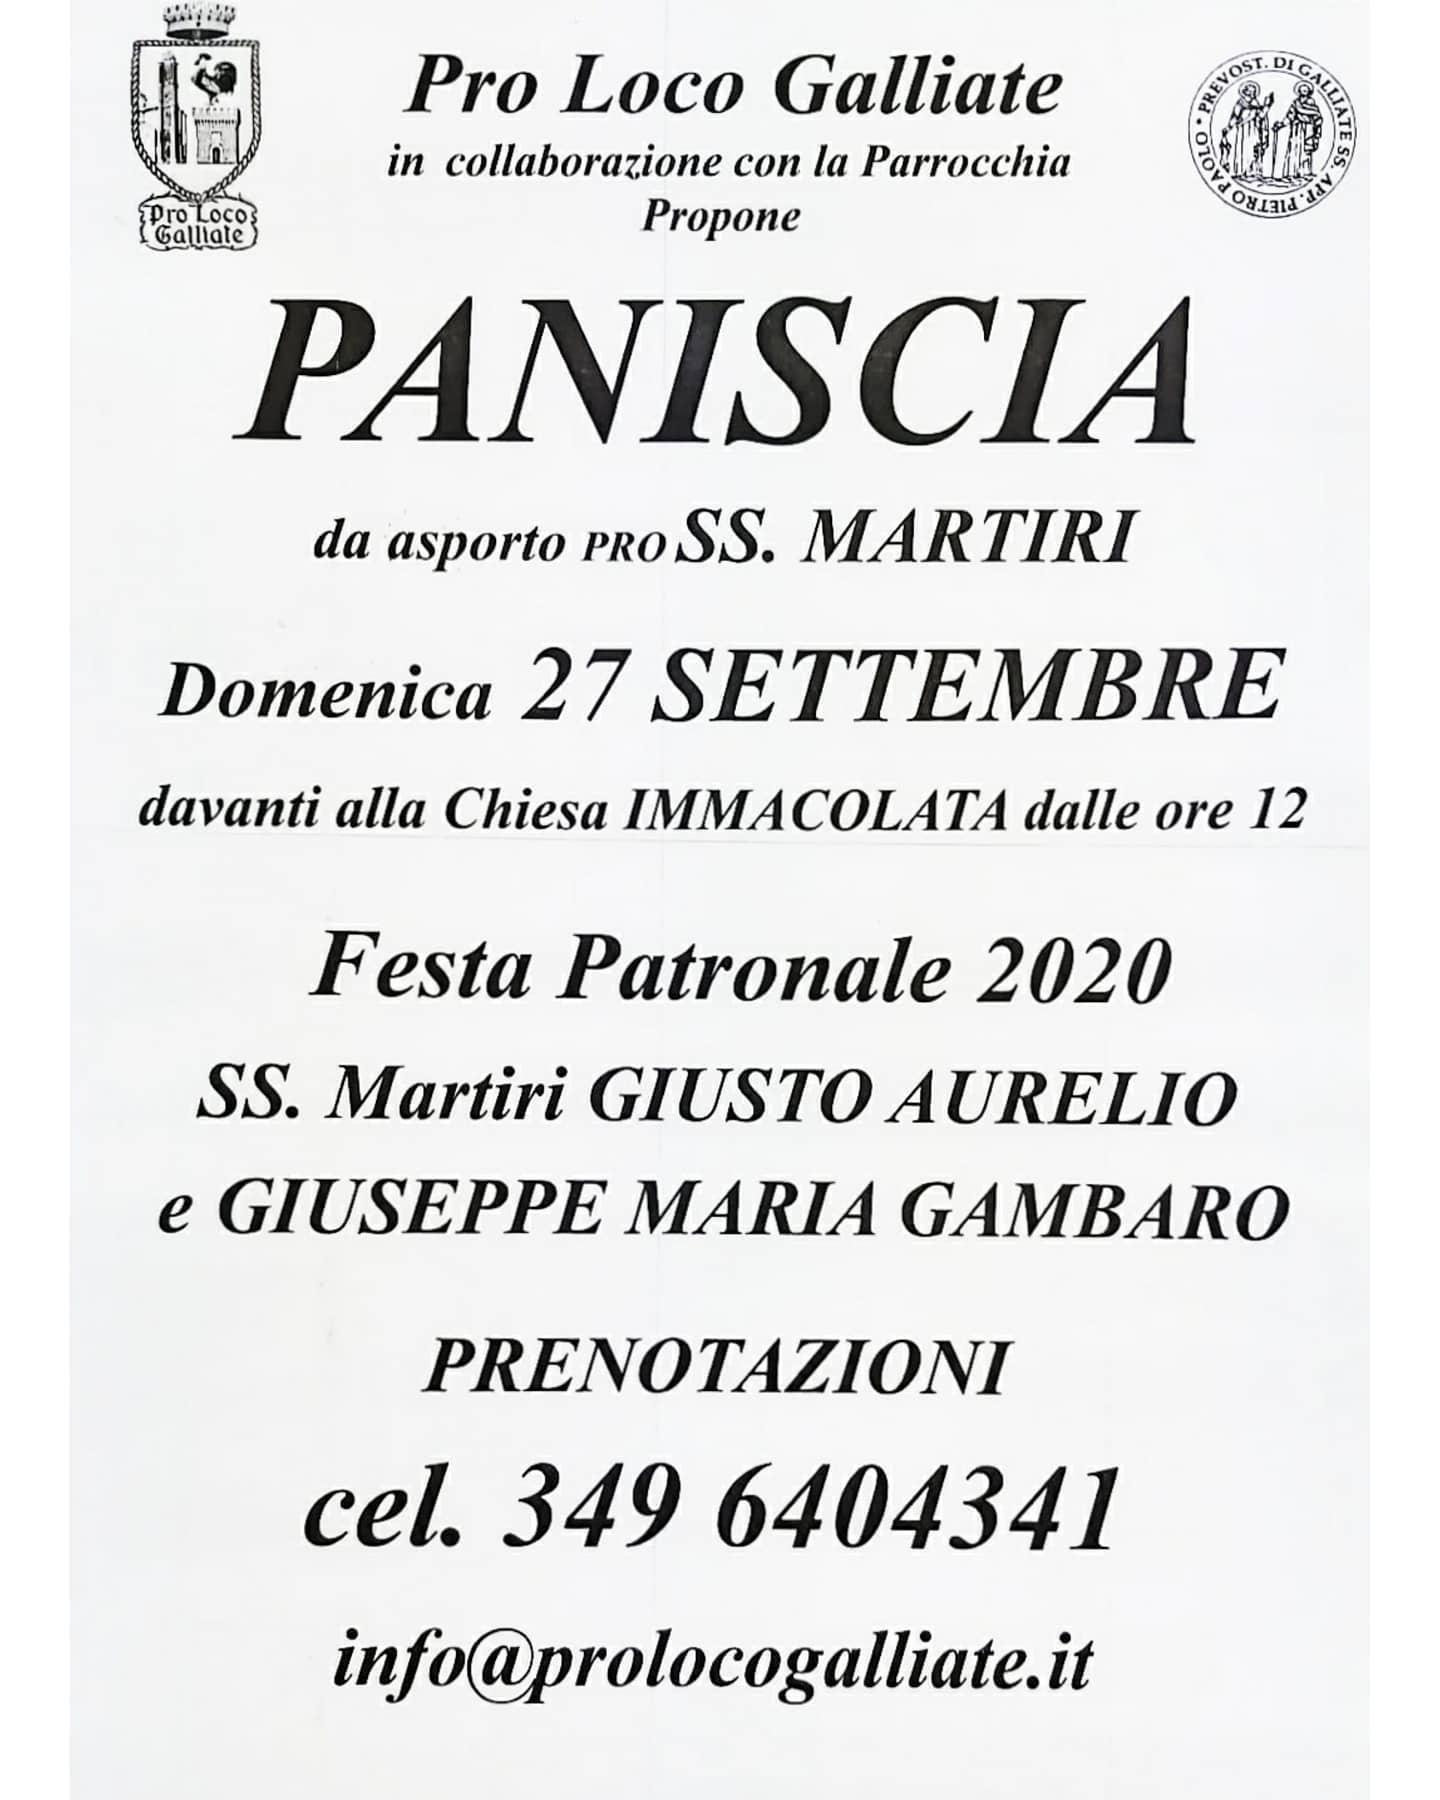 bt200927-Paniscia